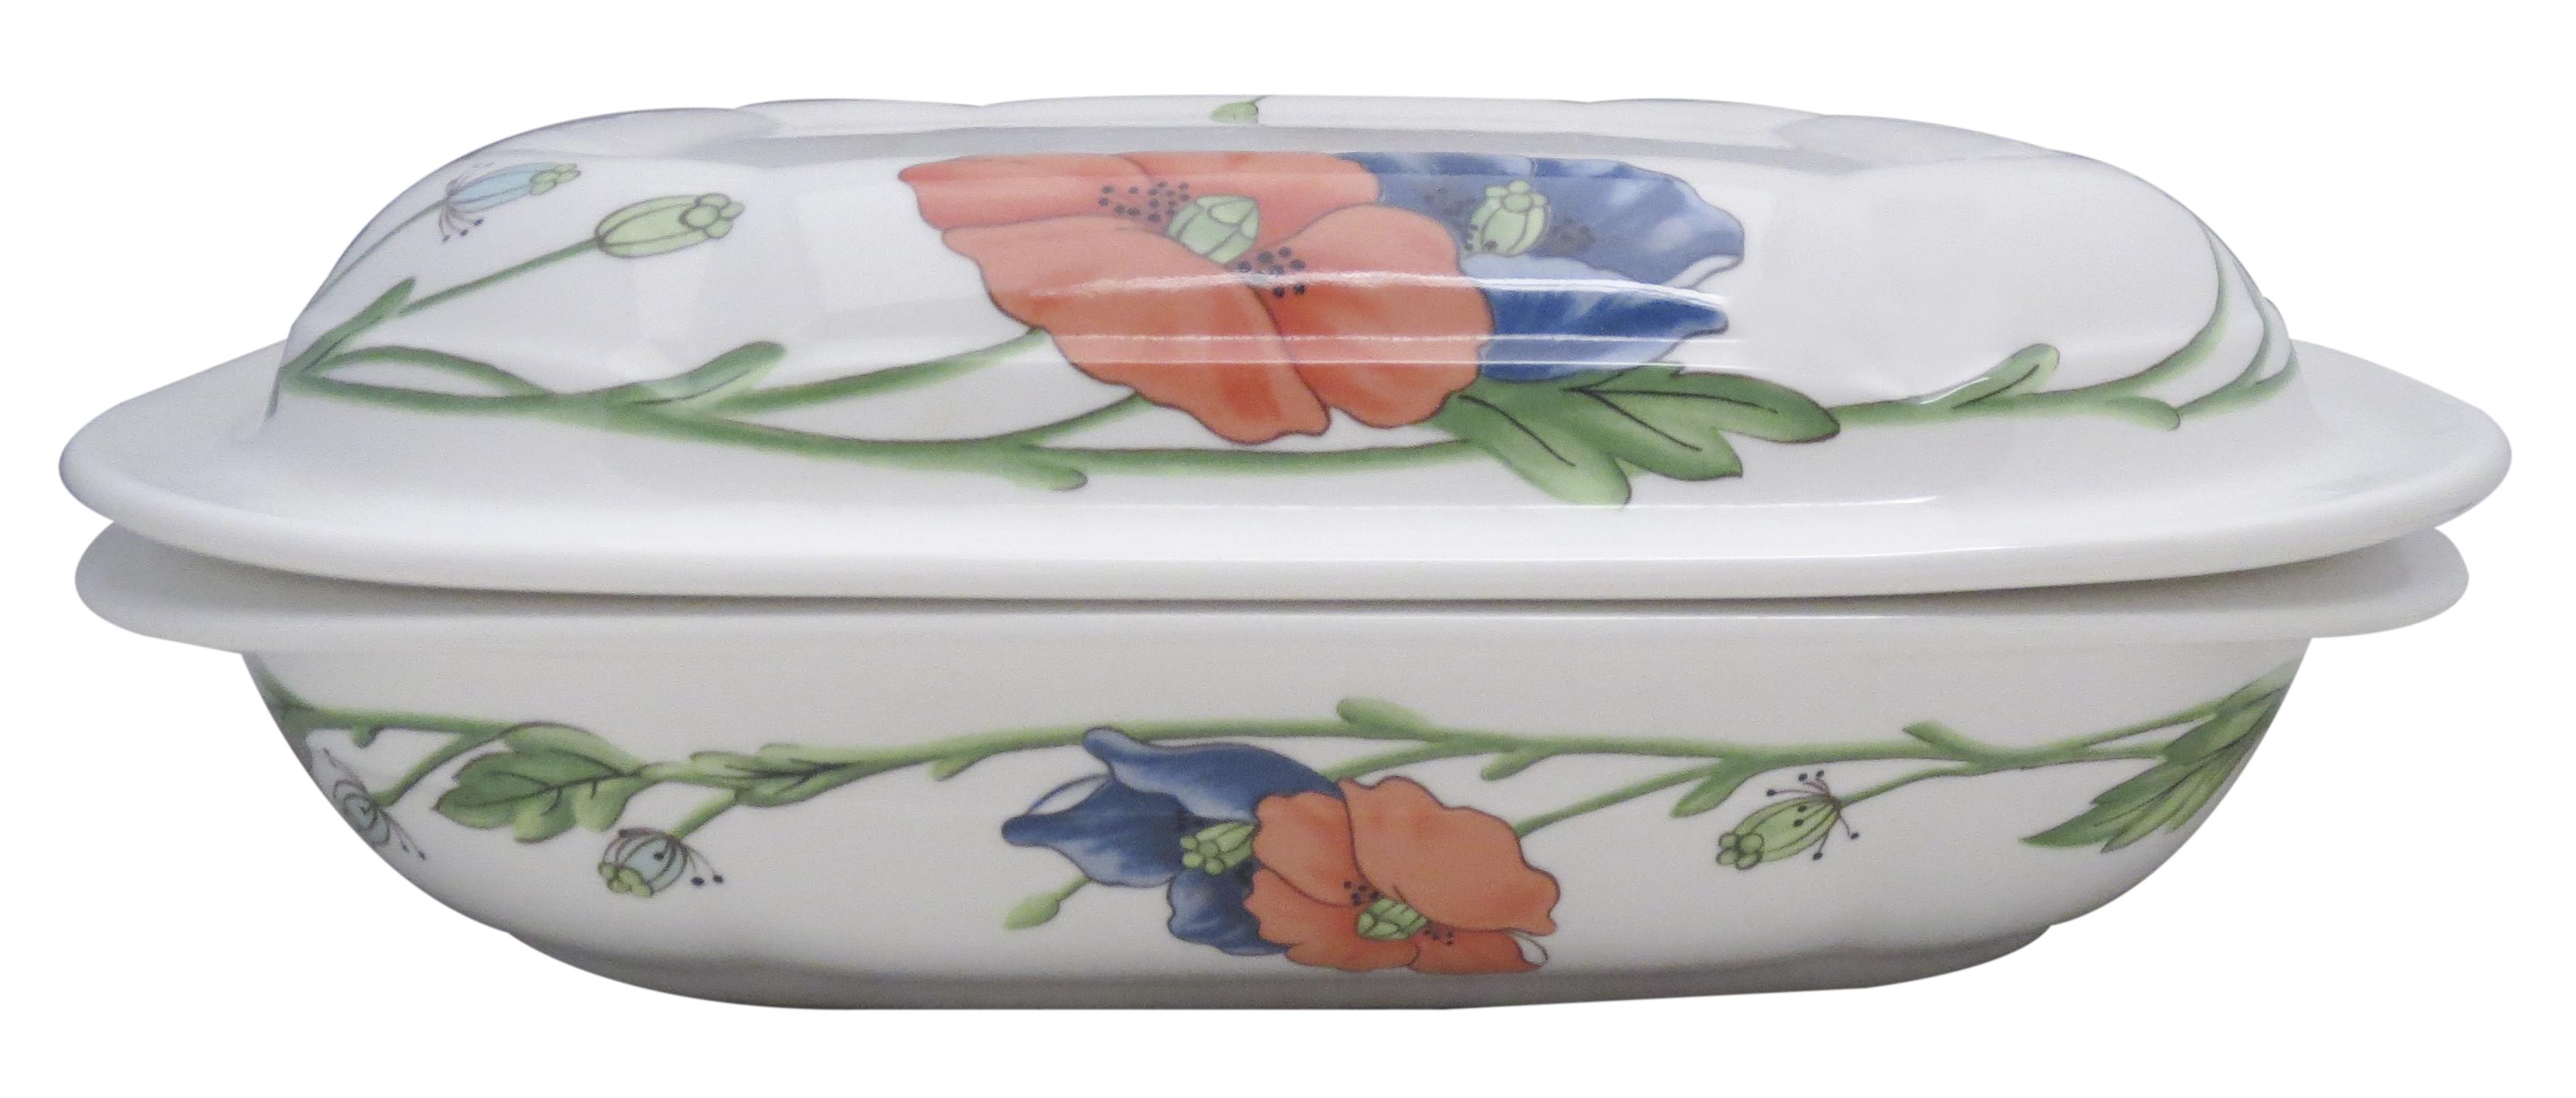 Villeroy boch amapola 2 quart square microwave baker - Villeroy y boch ...